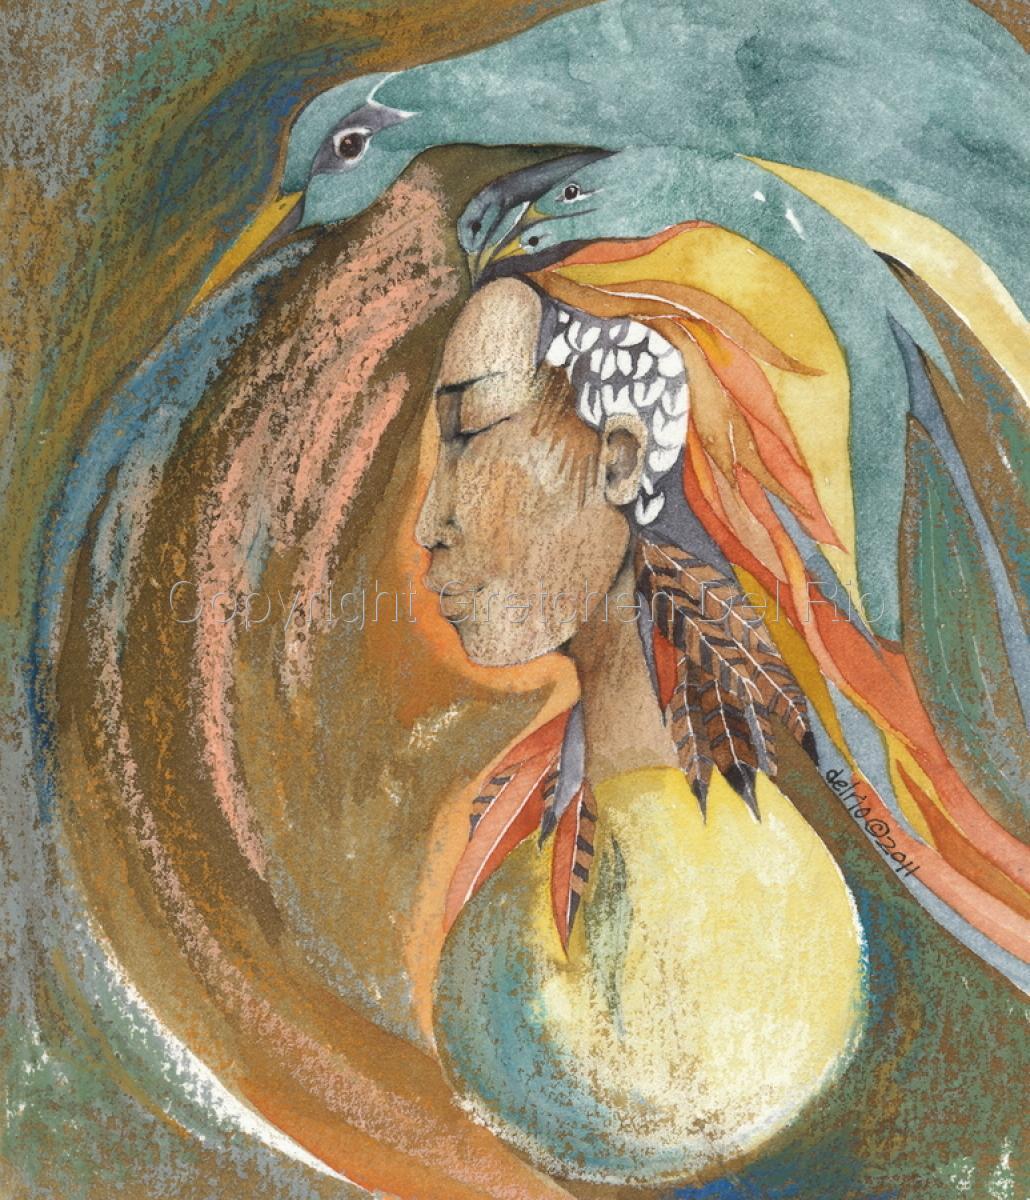 Bird Speak (large view)